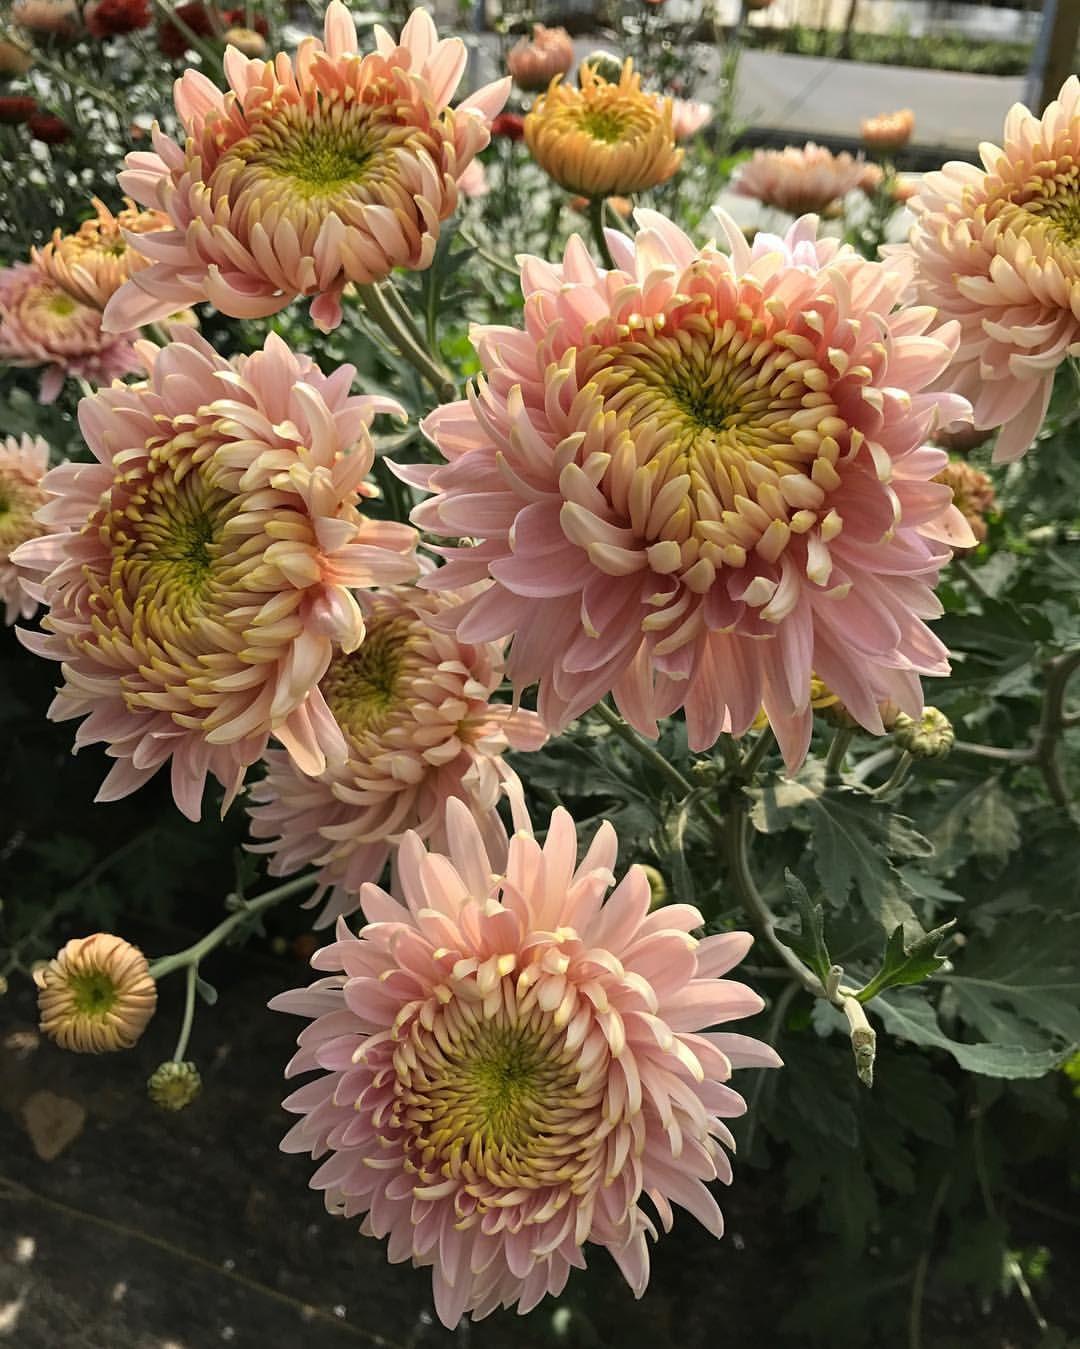 Pin by windy city girl on flowers flowers beautiful flowers plants